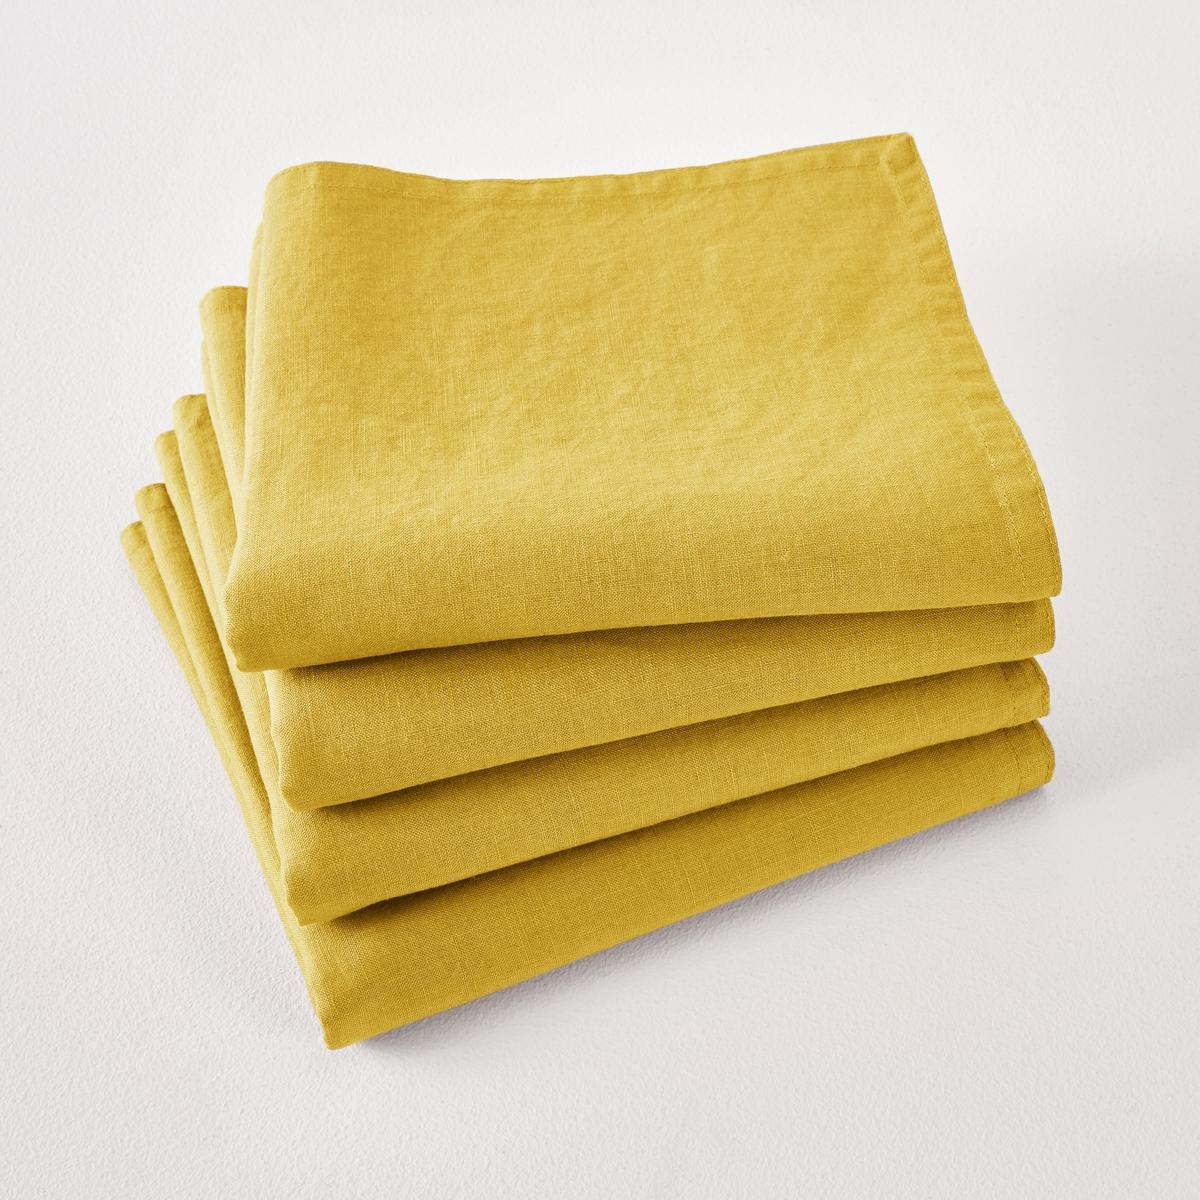 Комплект из салфеток Victorine La Redoute Из осветленного льна 45 x 45 см желтый комплект из салфеток из la redoute льна и хлопка border 45 x 45 см бежевый